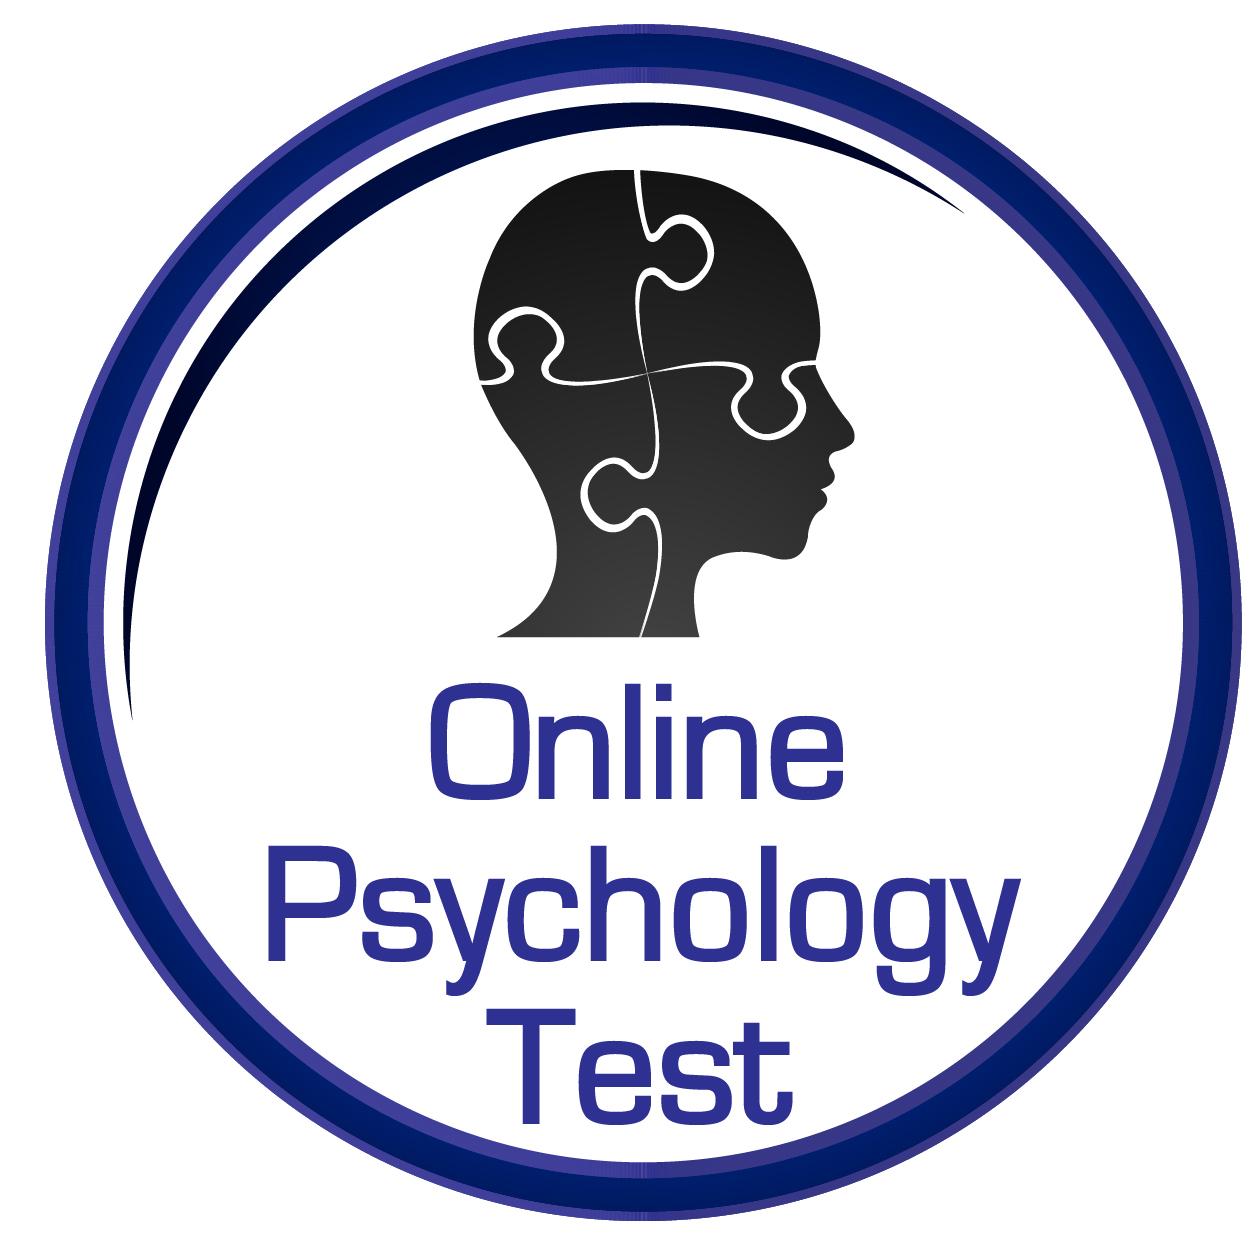 Online Psychology Test